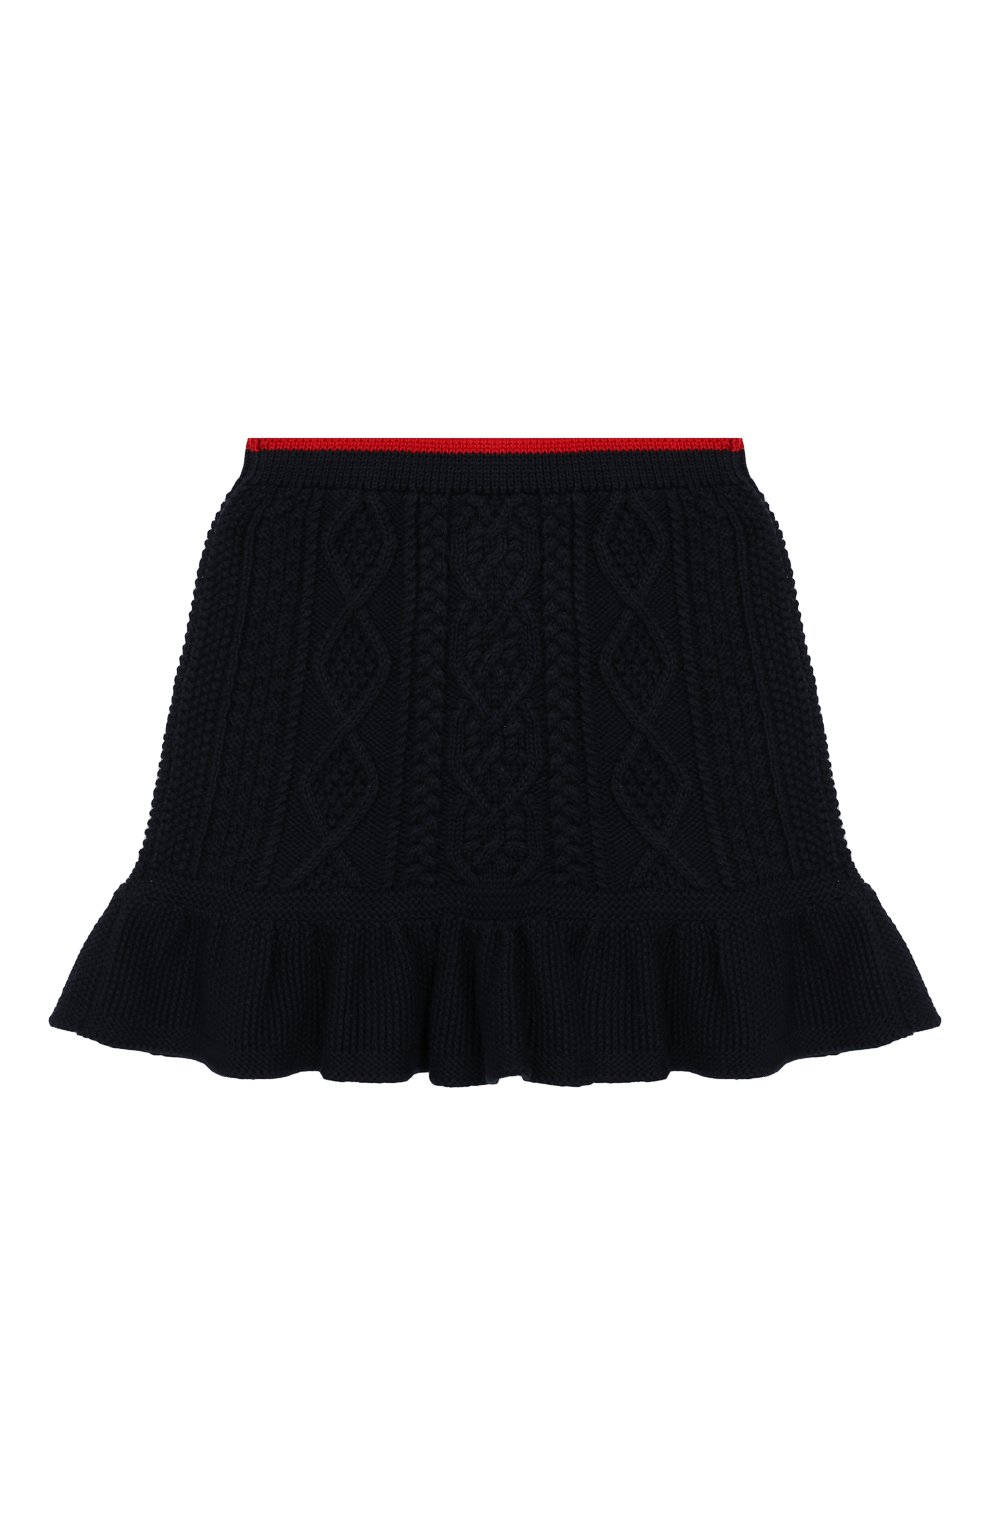 Детский комплект из юбки и топа POLO RALPH LAUREN синего цвета, арт. 311736827 | Фото 5